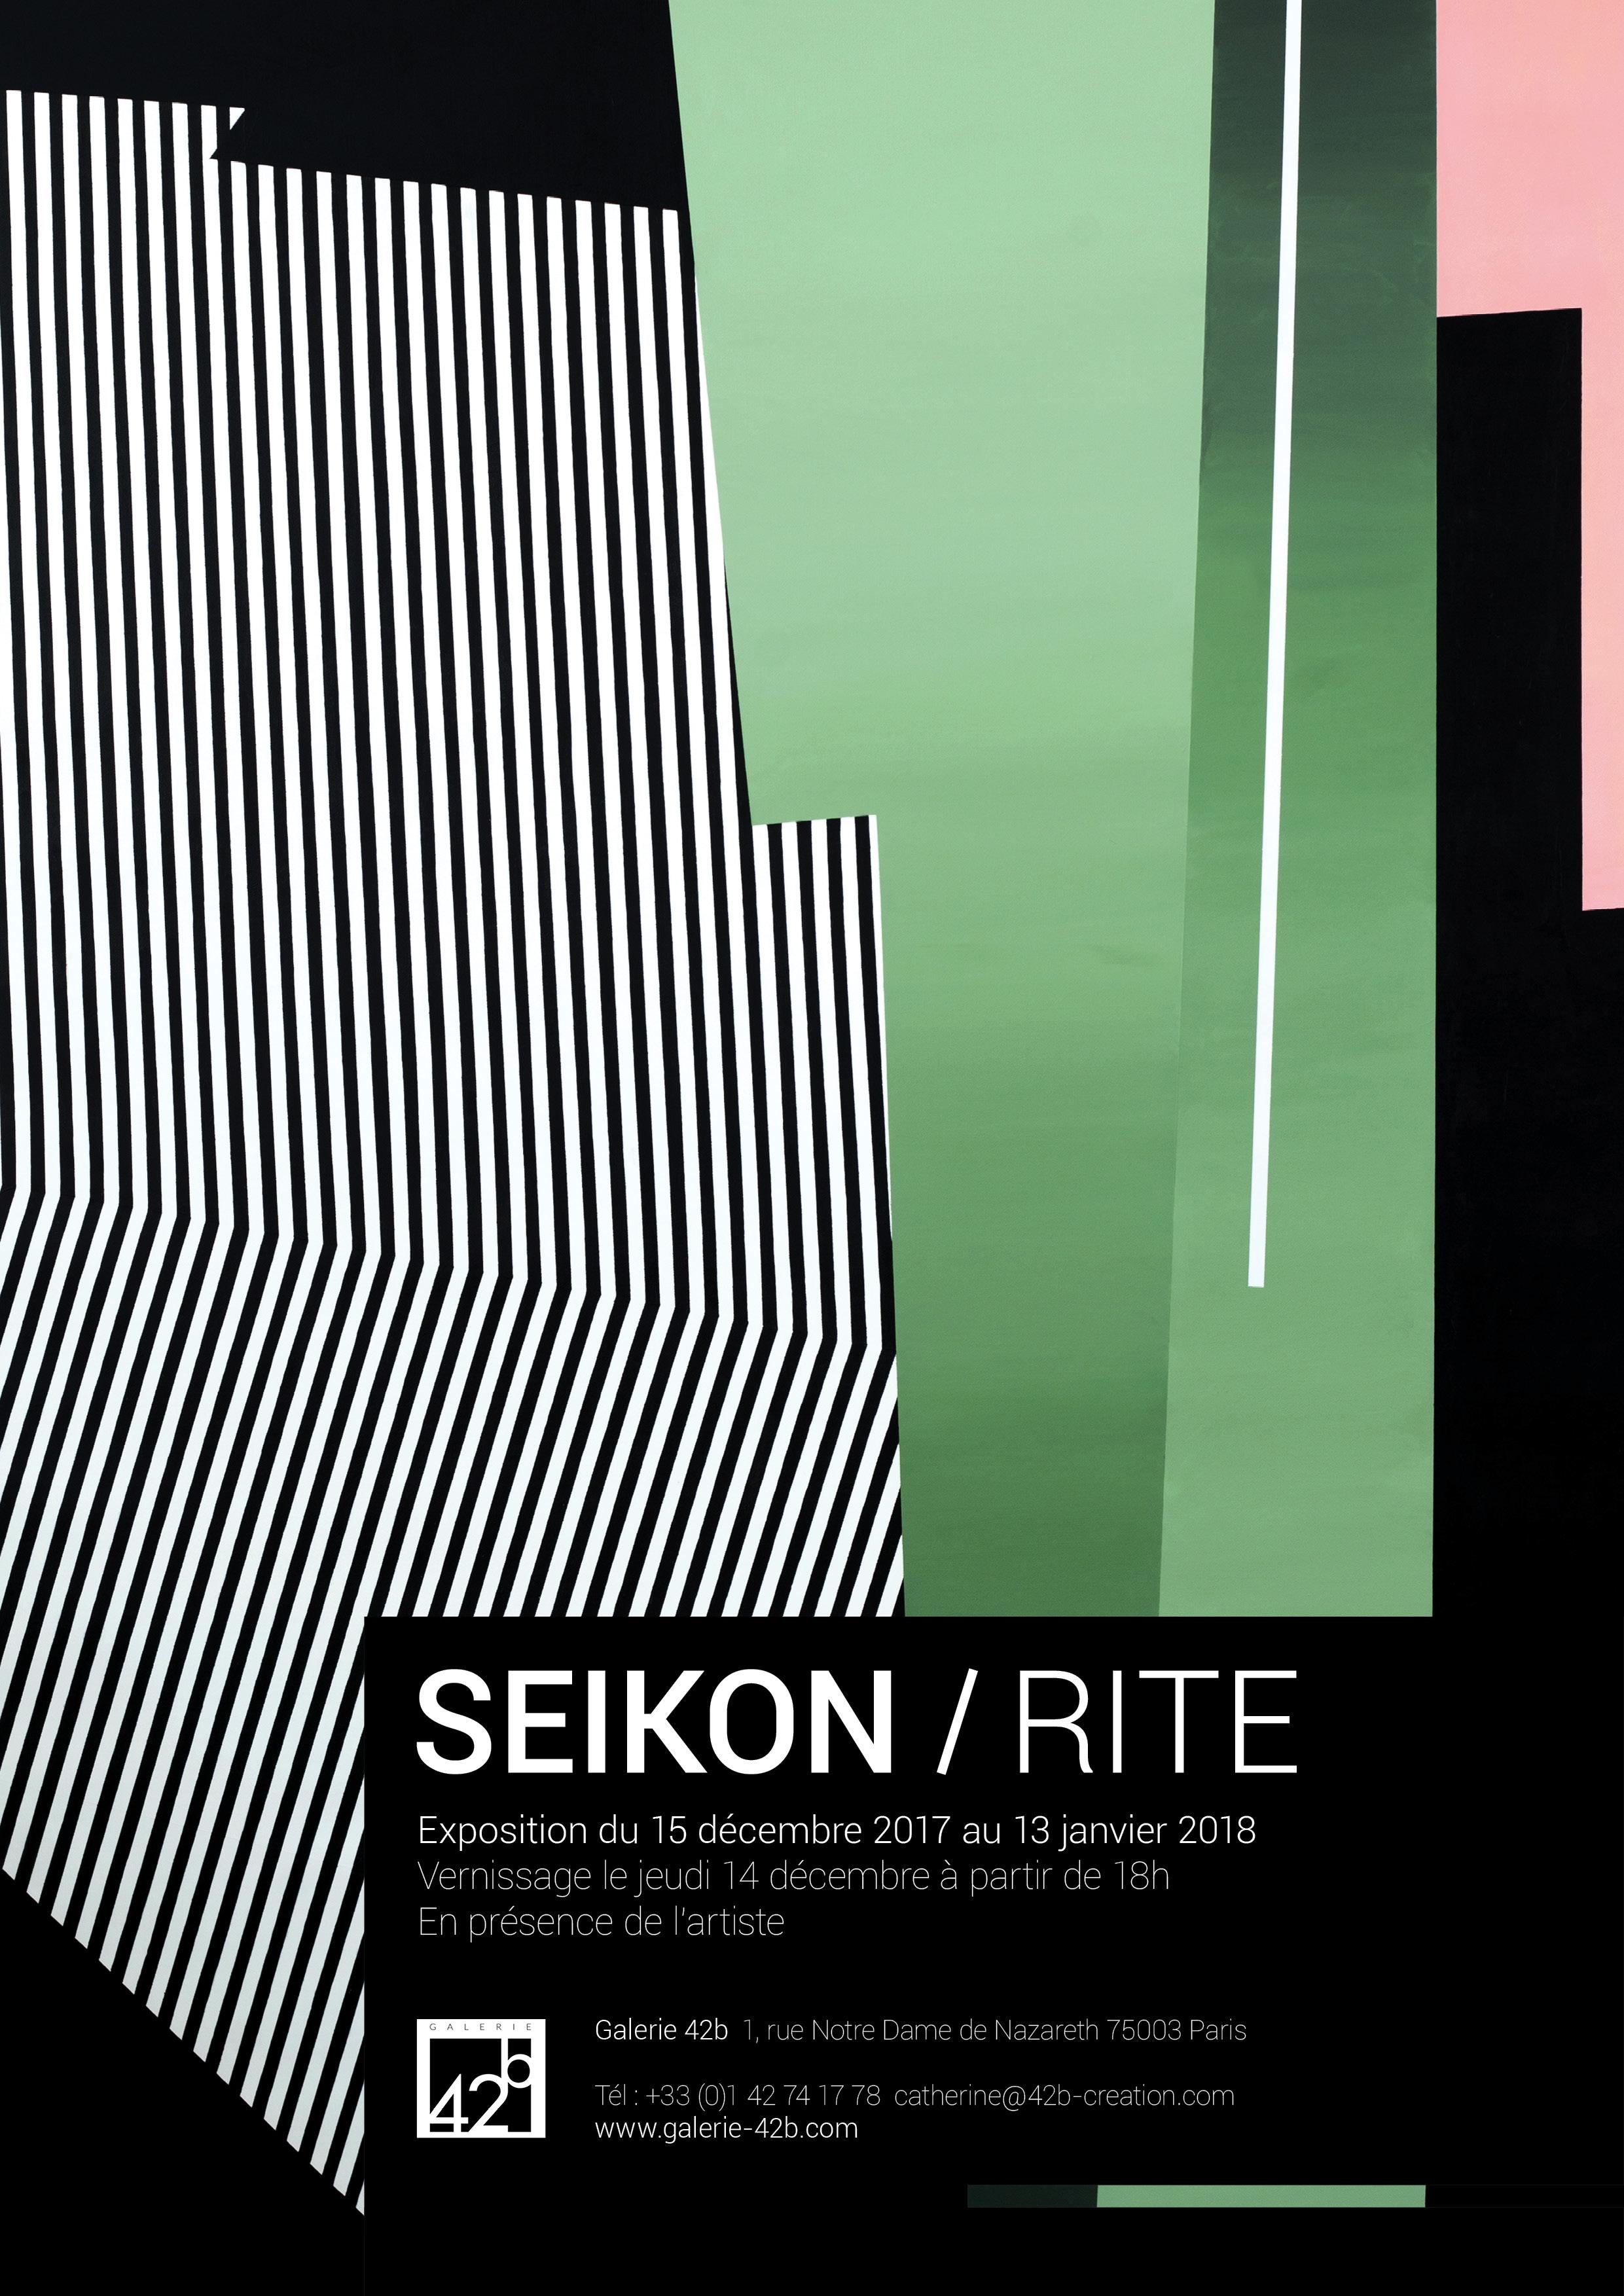 Invitation ROBERT SEIKON - RITE